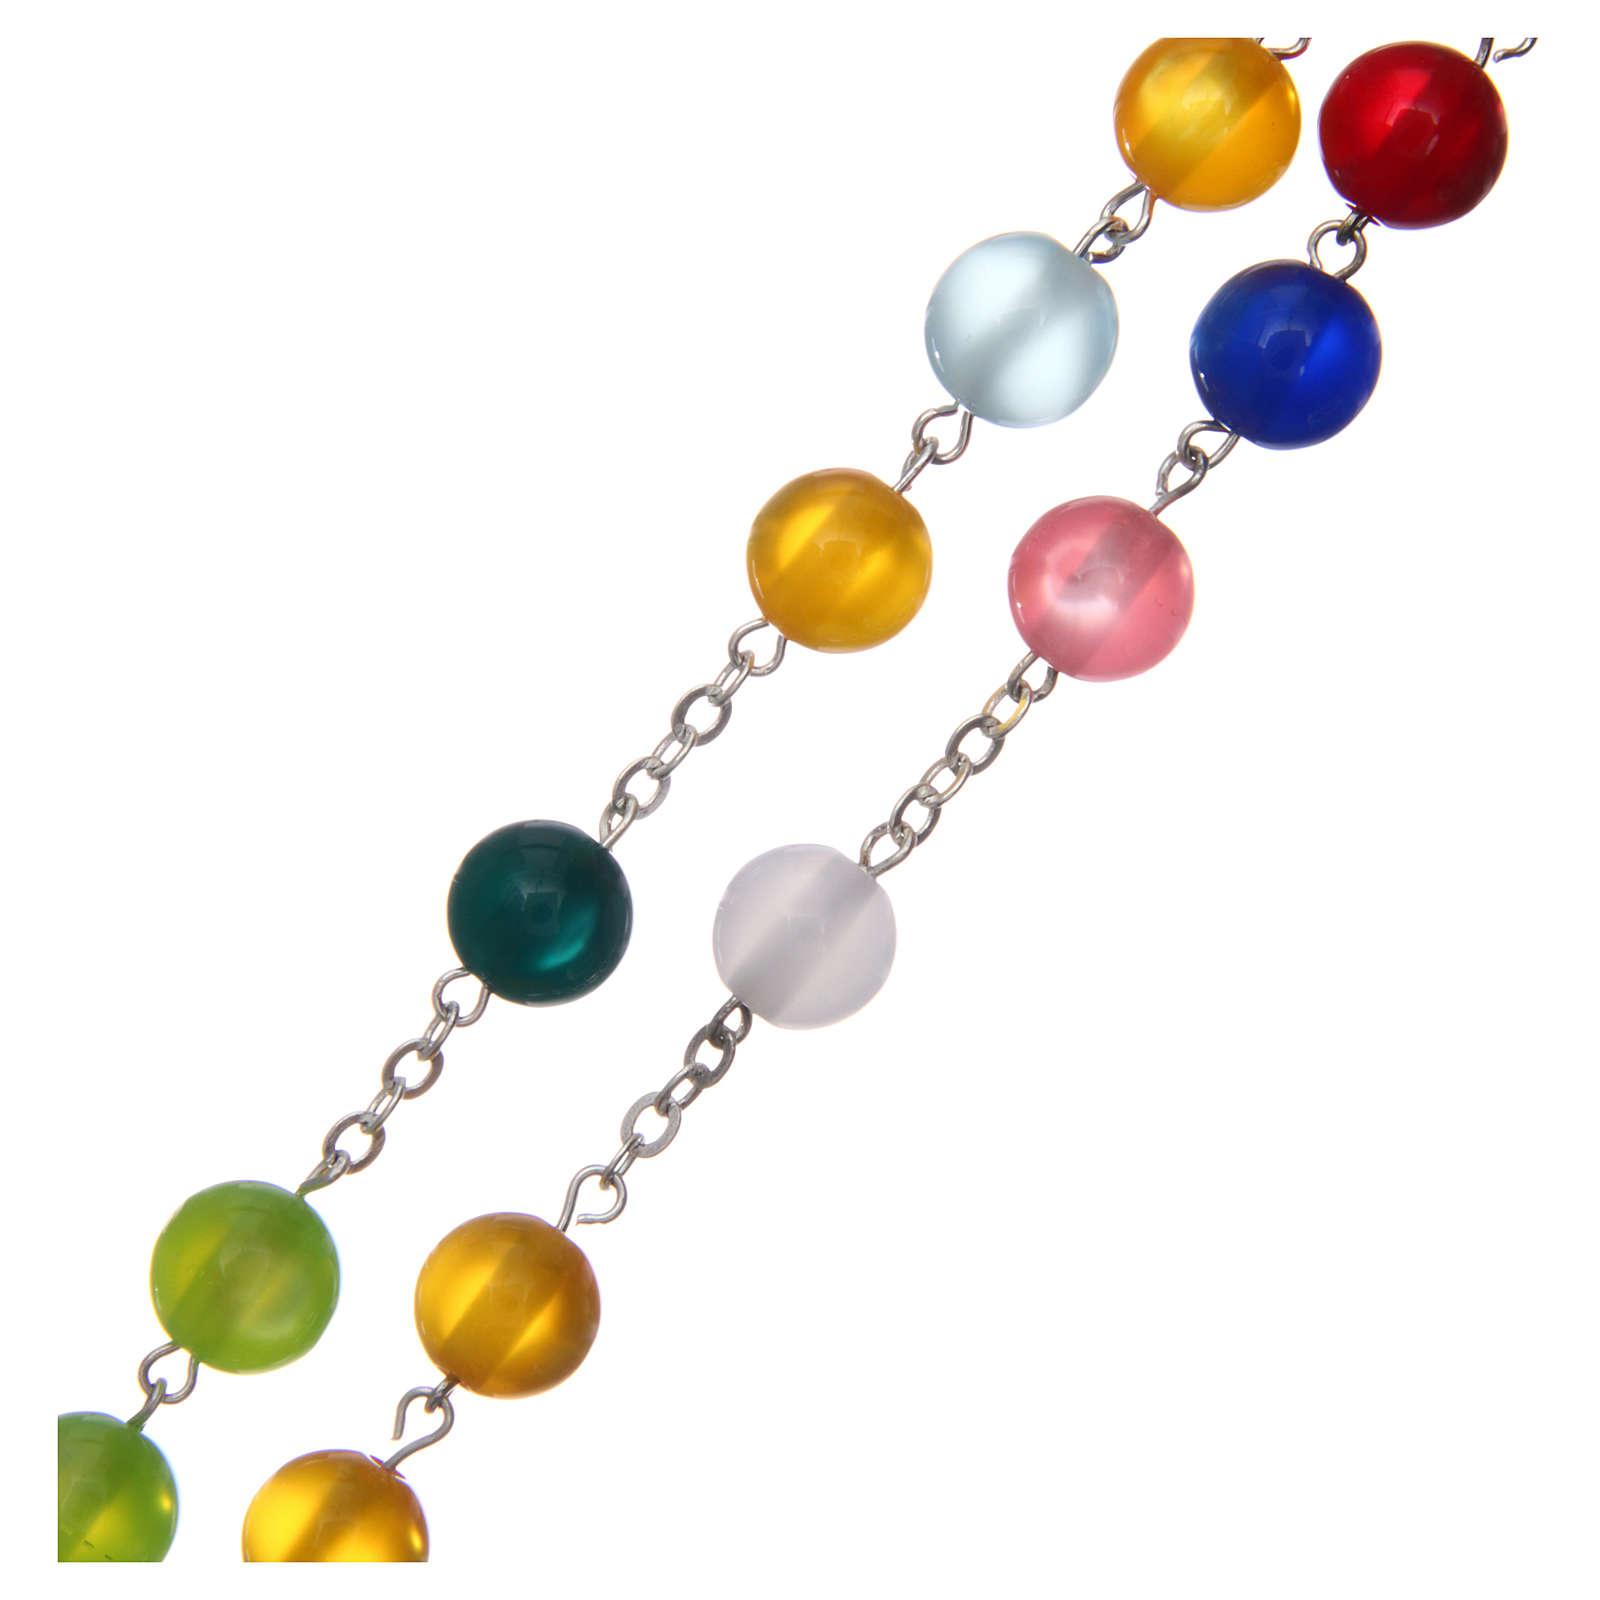 Rosario imitazione madreperla multicolore 10 mm 4